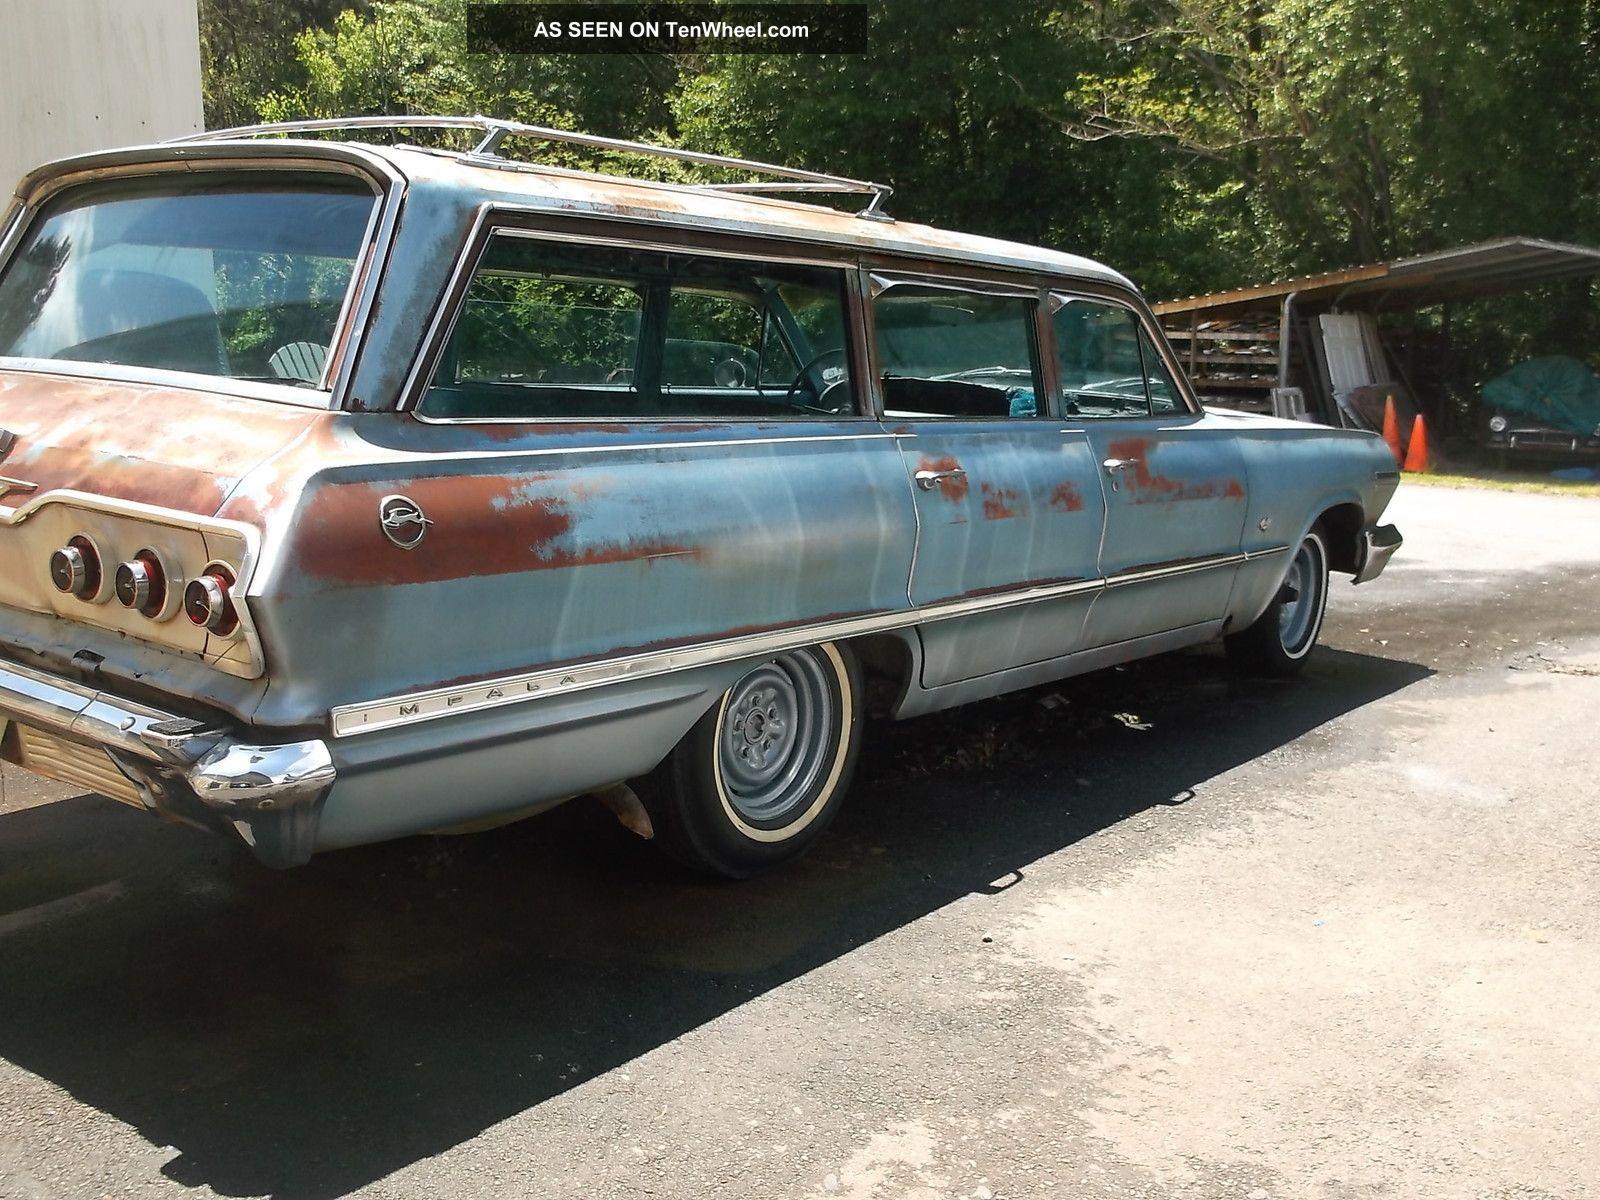 1963 chevrolet impala station wagon. Black Bedroom Furniture Sets. Home Design Ideas